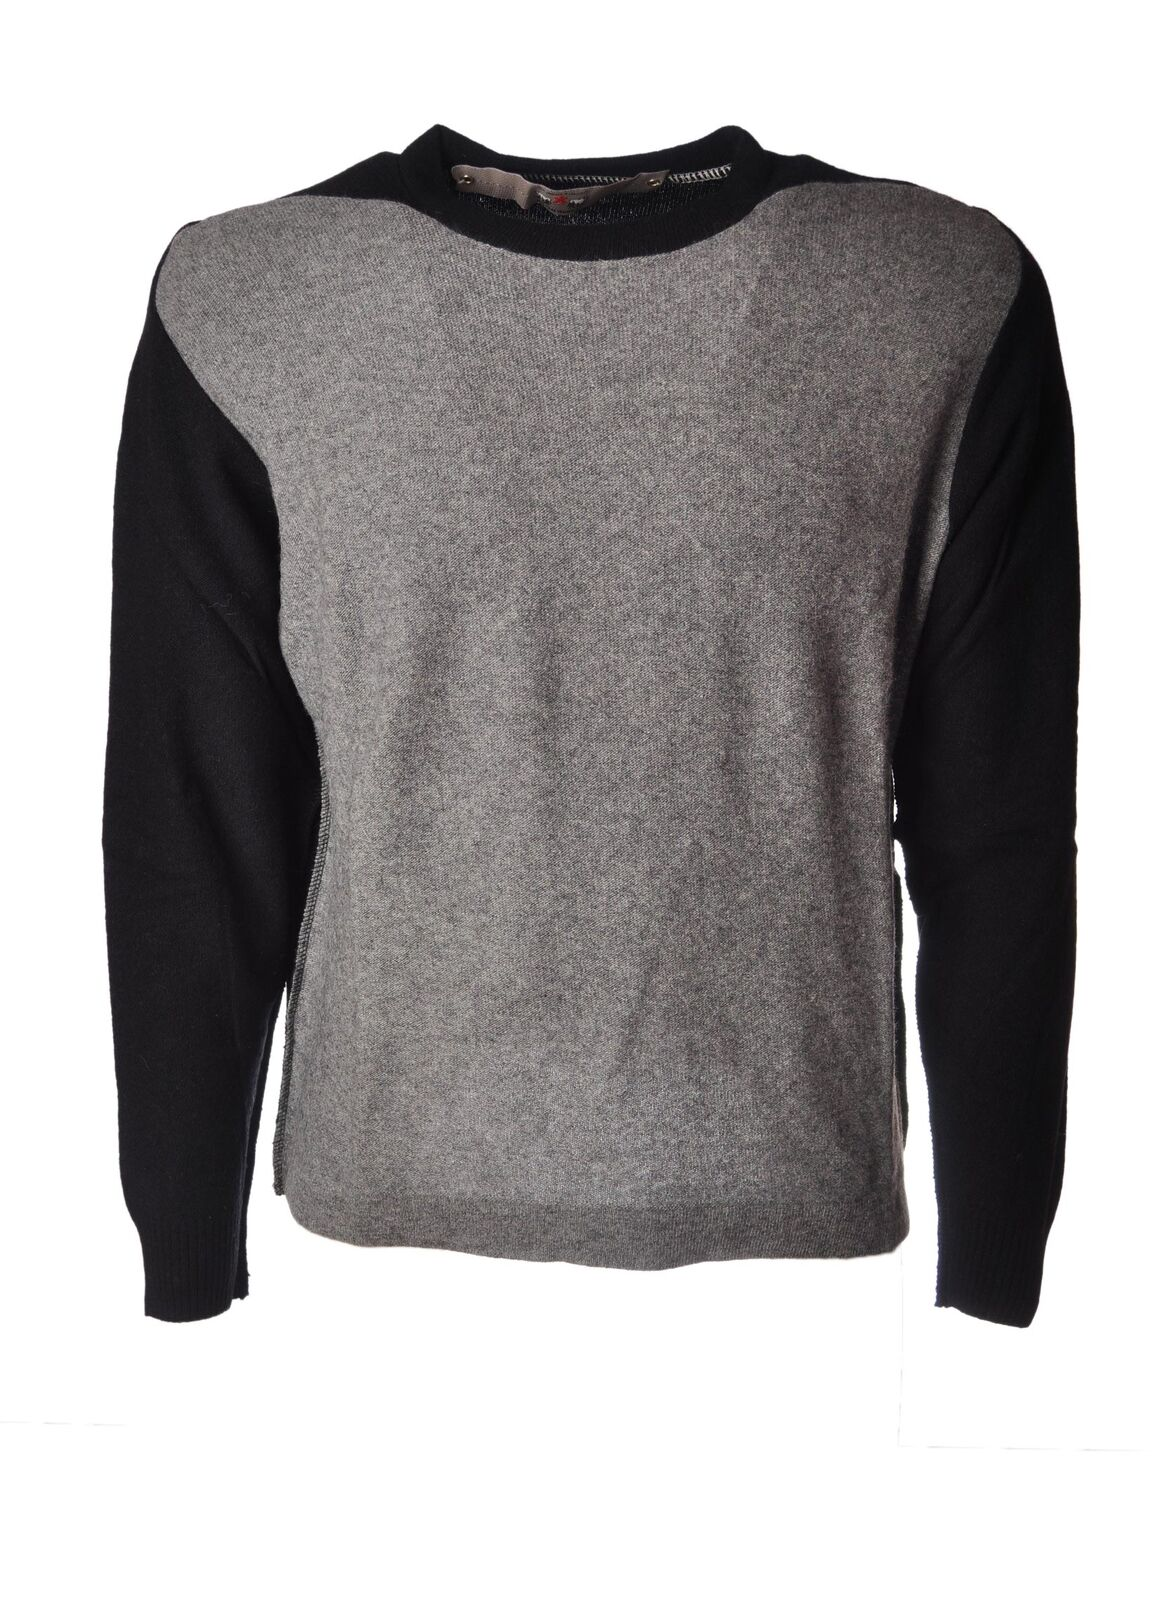 Bryan Husky  -  Sweaters - Male - Fantasy - 4512024A184823